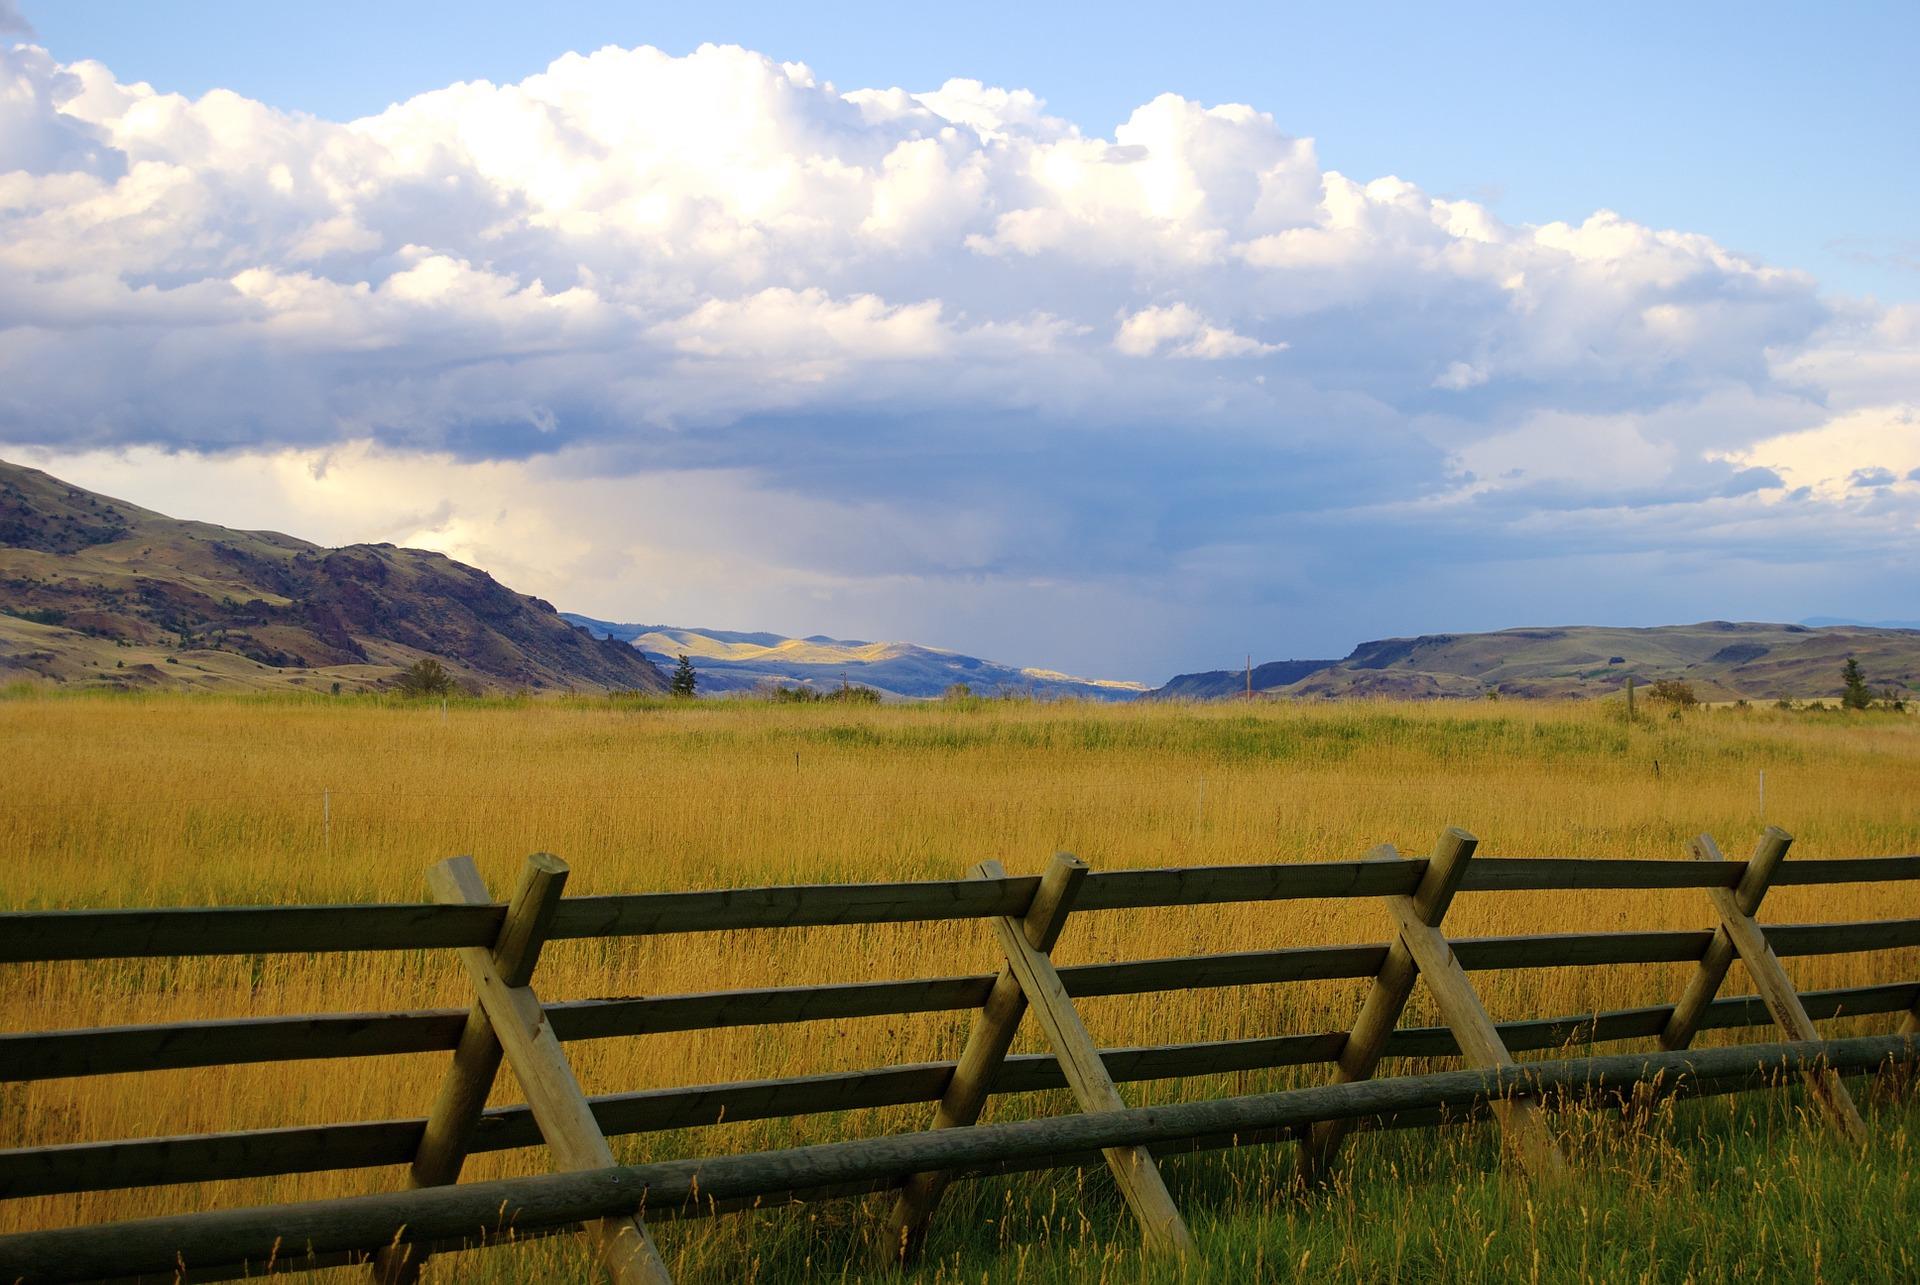 fence-951963_1920